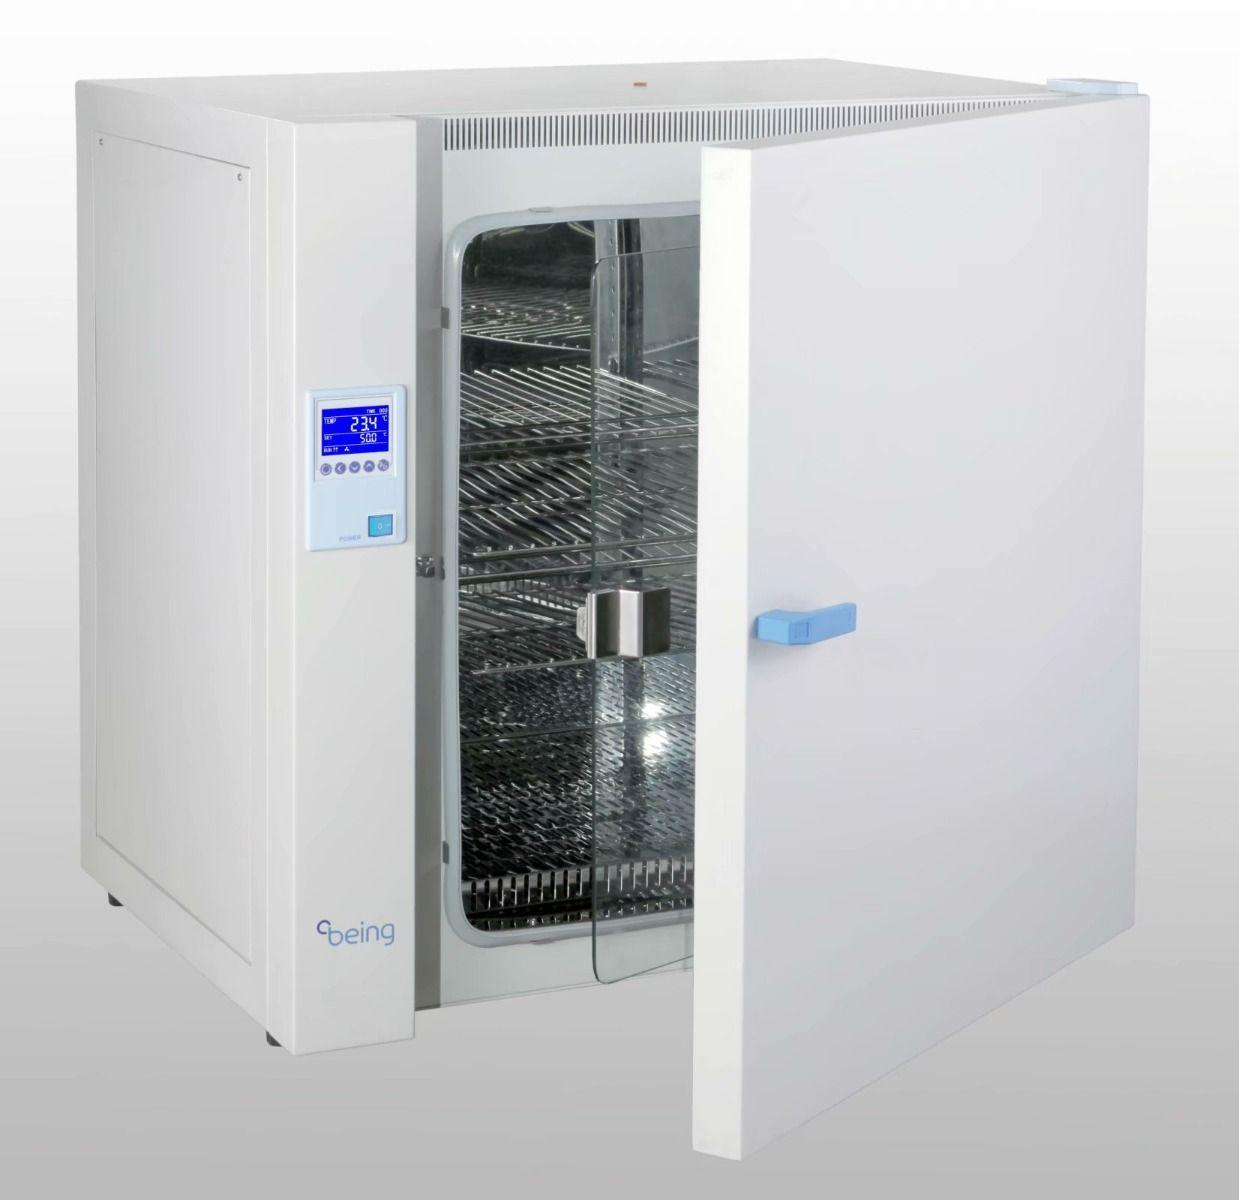 BIT-200 BEING Incubator, amb.+5℃-80℃, 228 liters